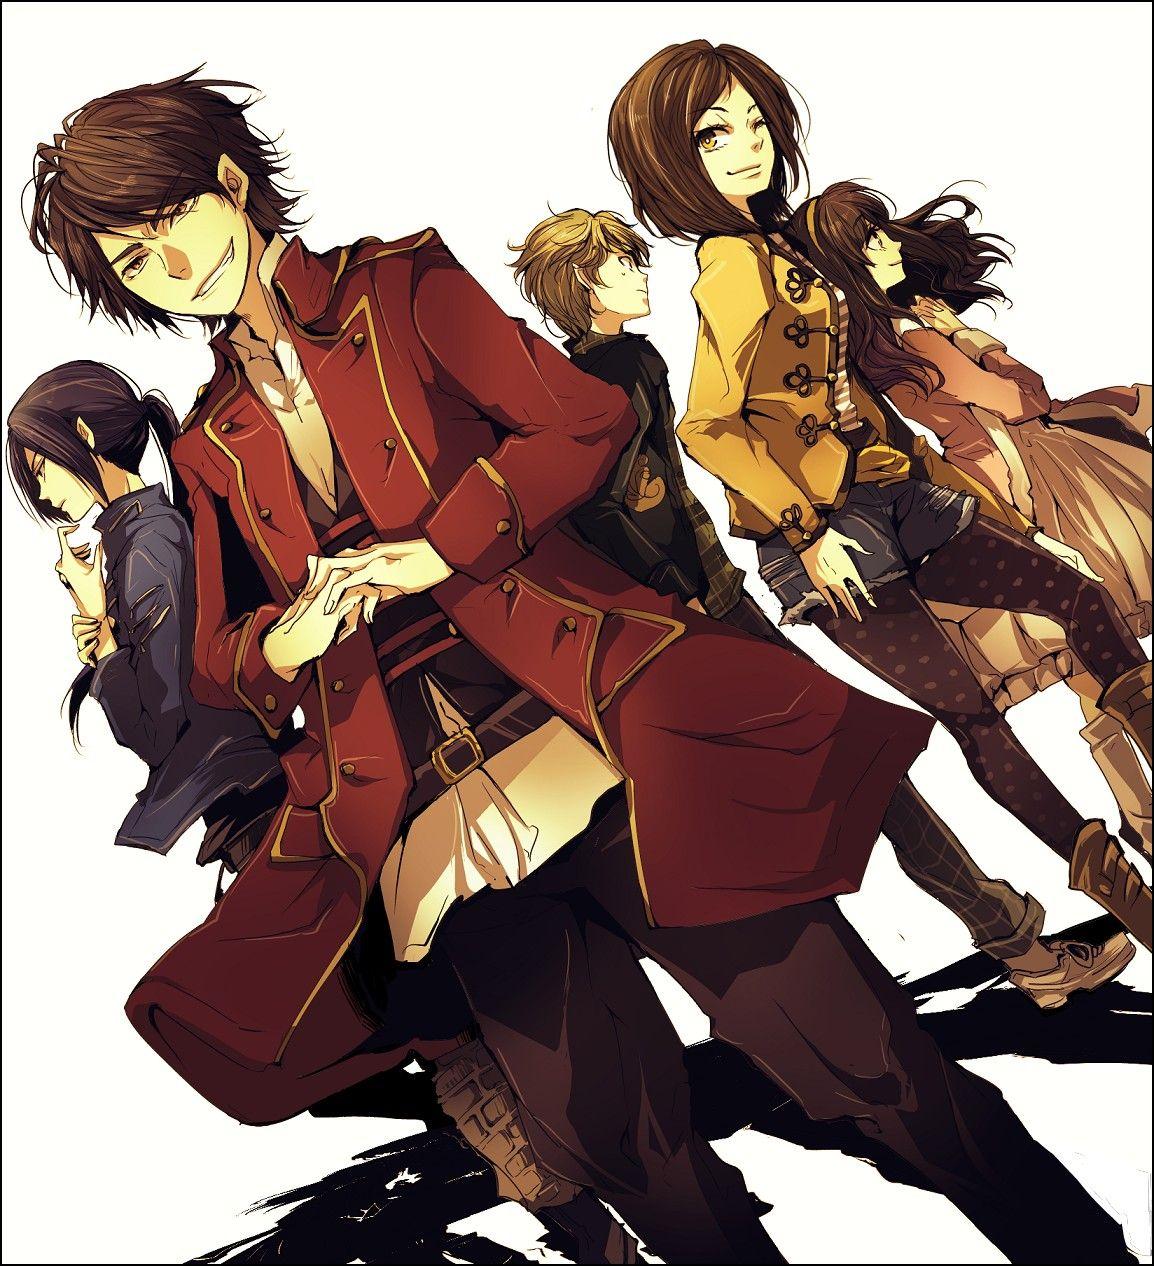 Images for Kaizoku Sentai Gokaiger (anime) | illustrate ...